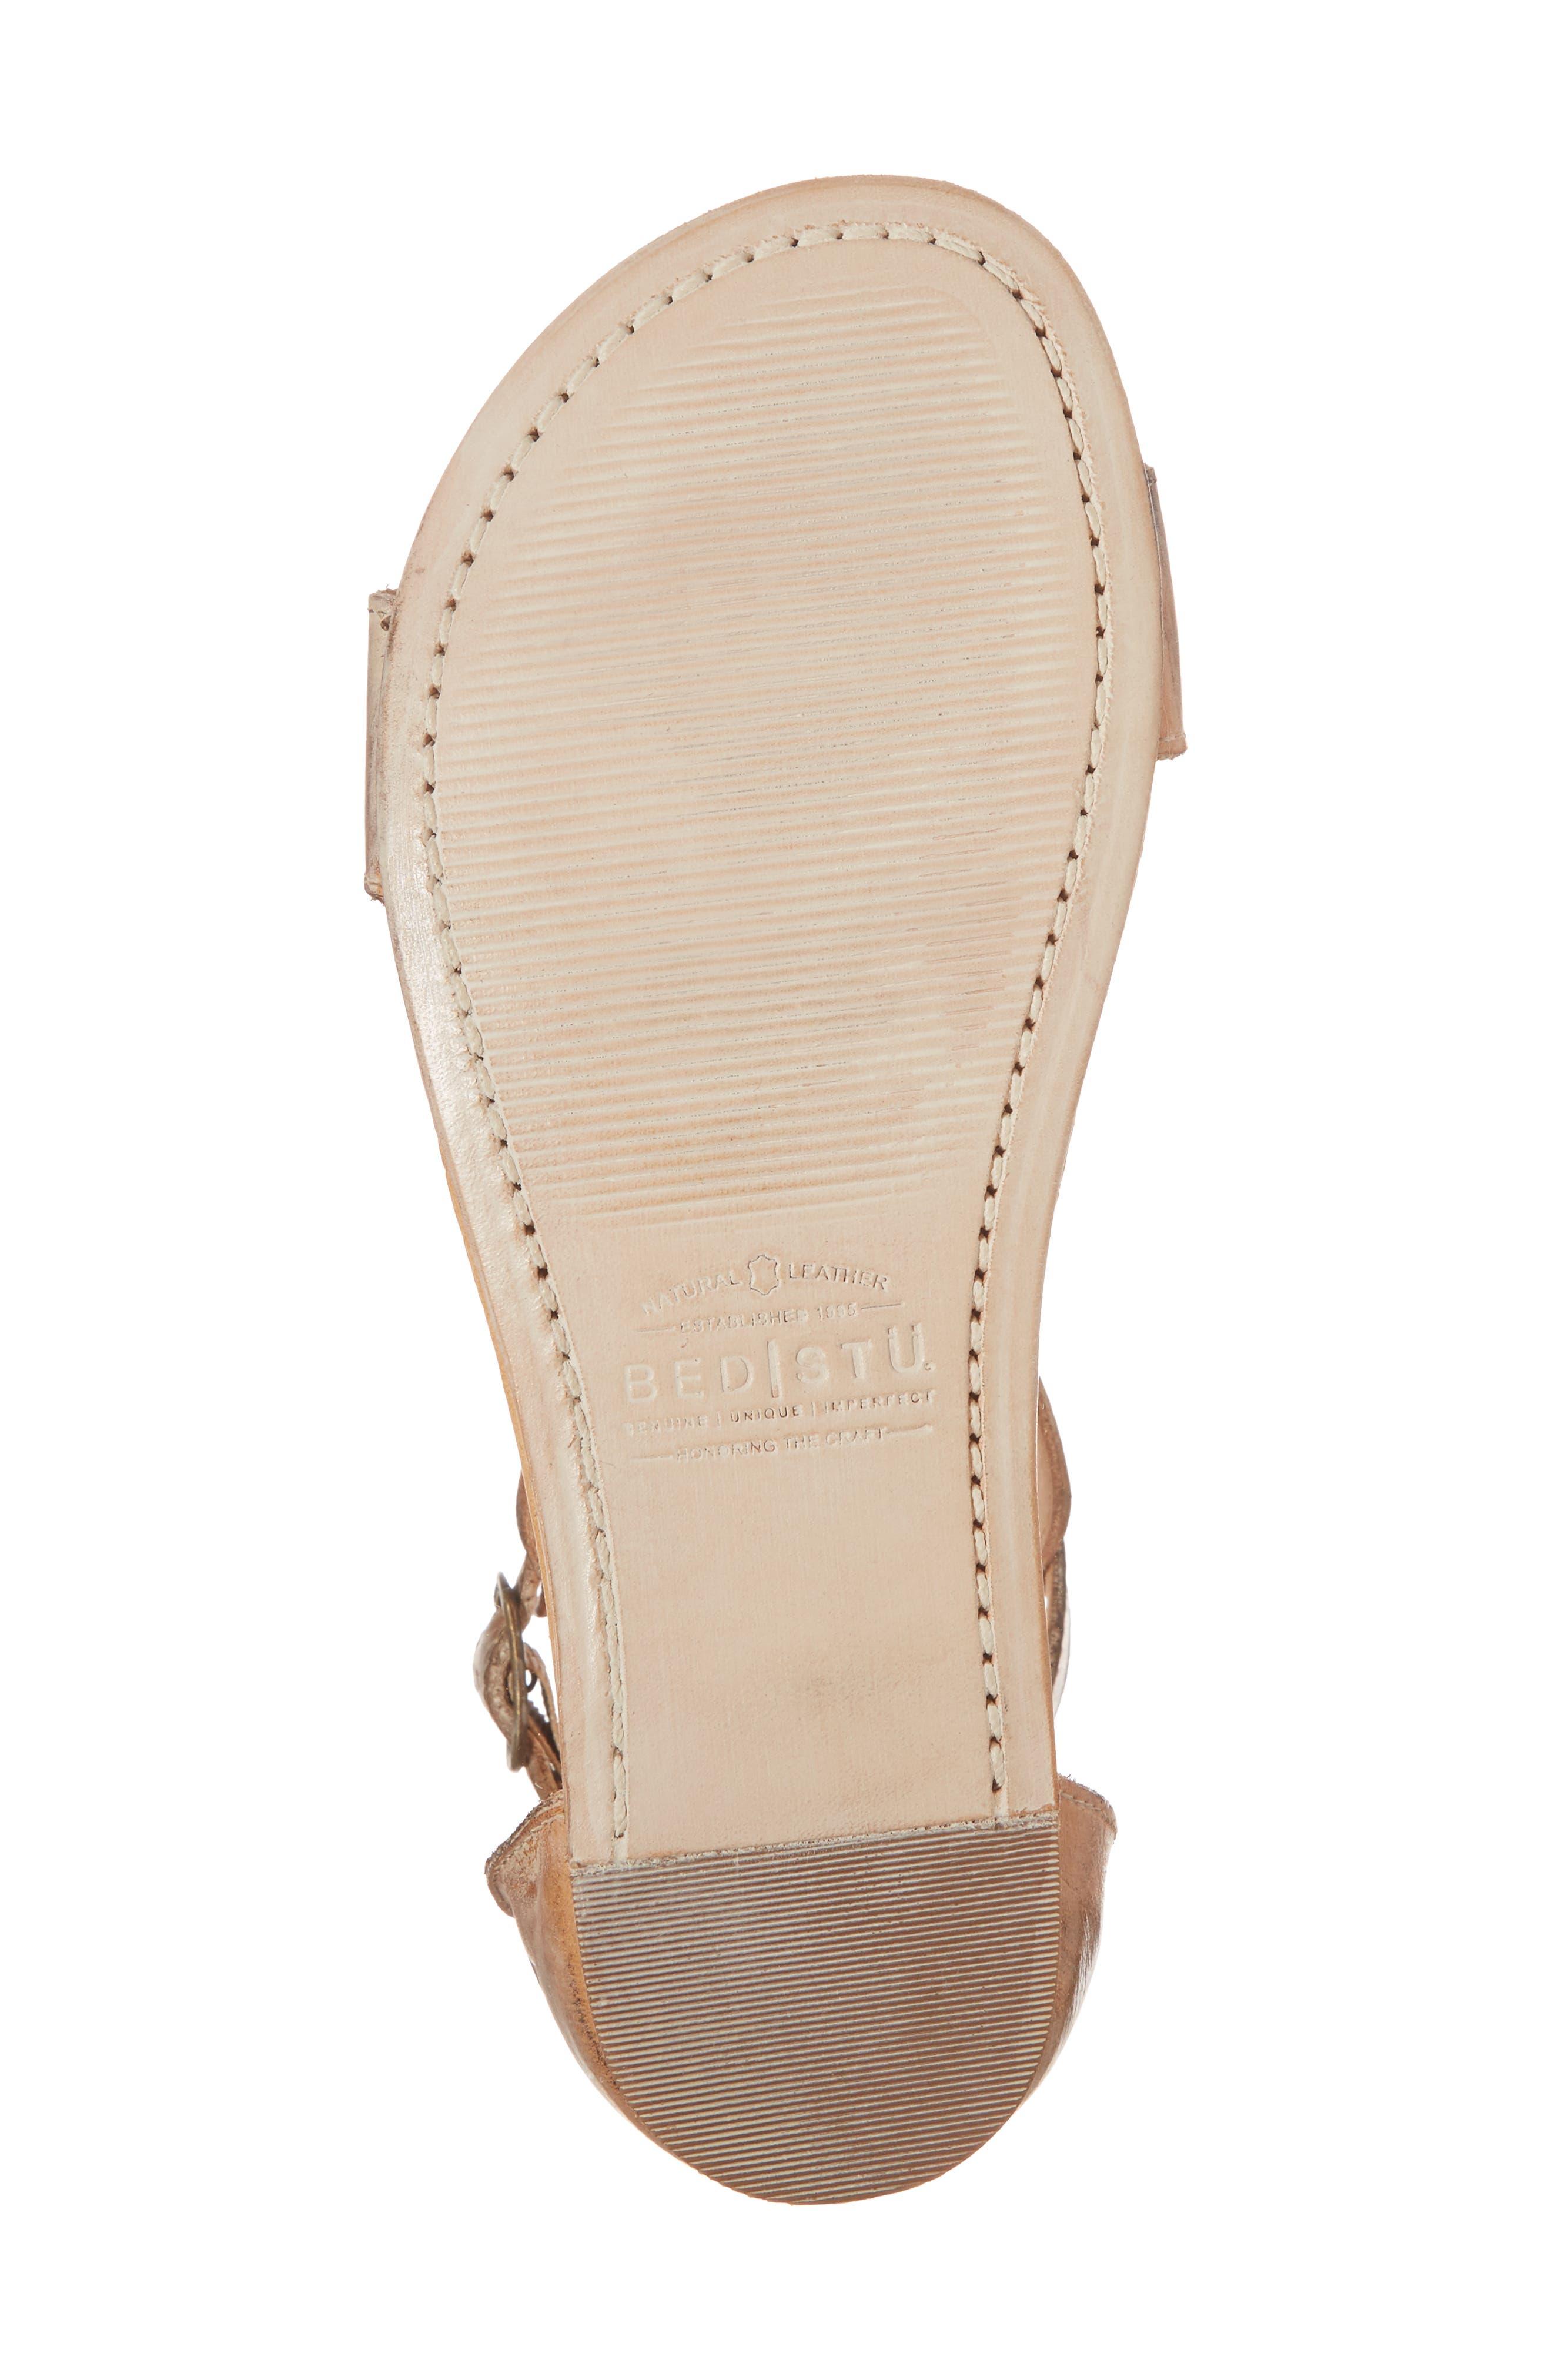 Sable Sandal,                             Alternate thumbnail 6, color,                             Tan/ White Leather